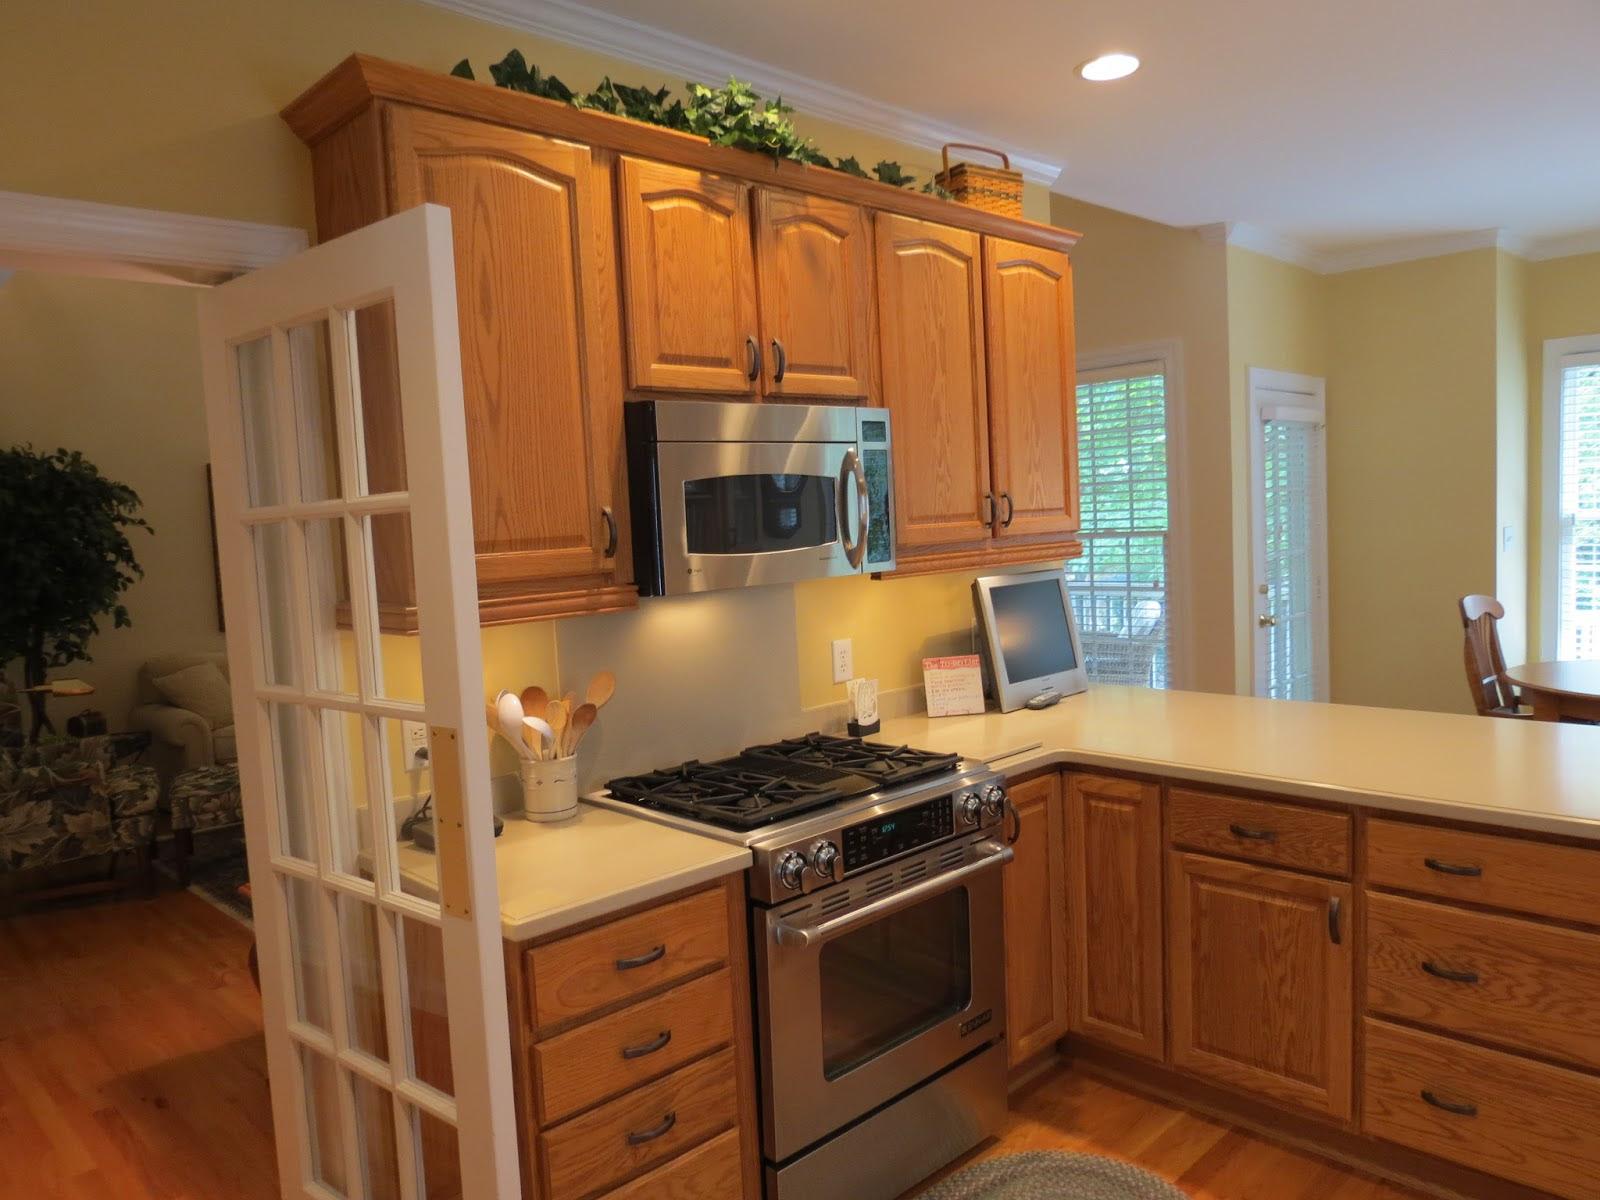 Best Kitchen Paint Colors With Oak Cabinets - My Kitchen ...